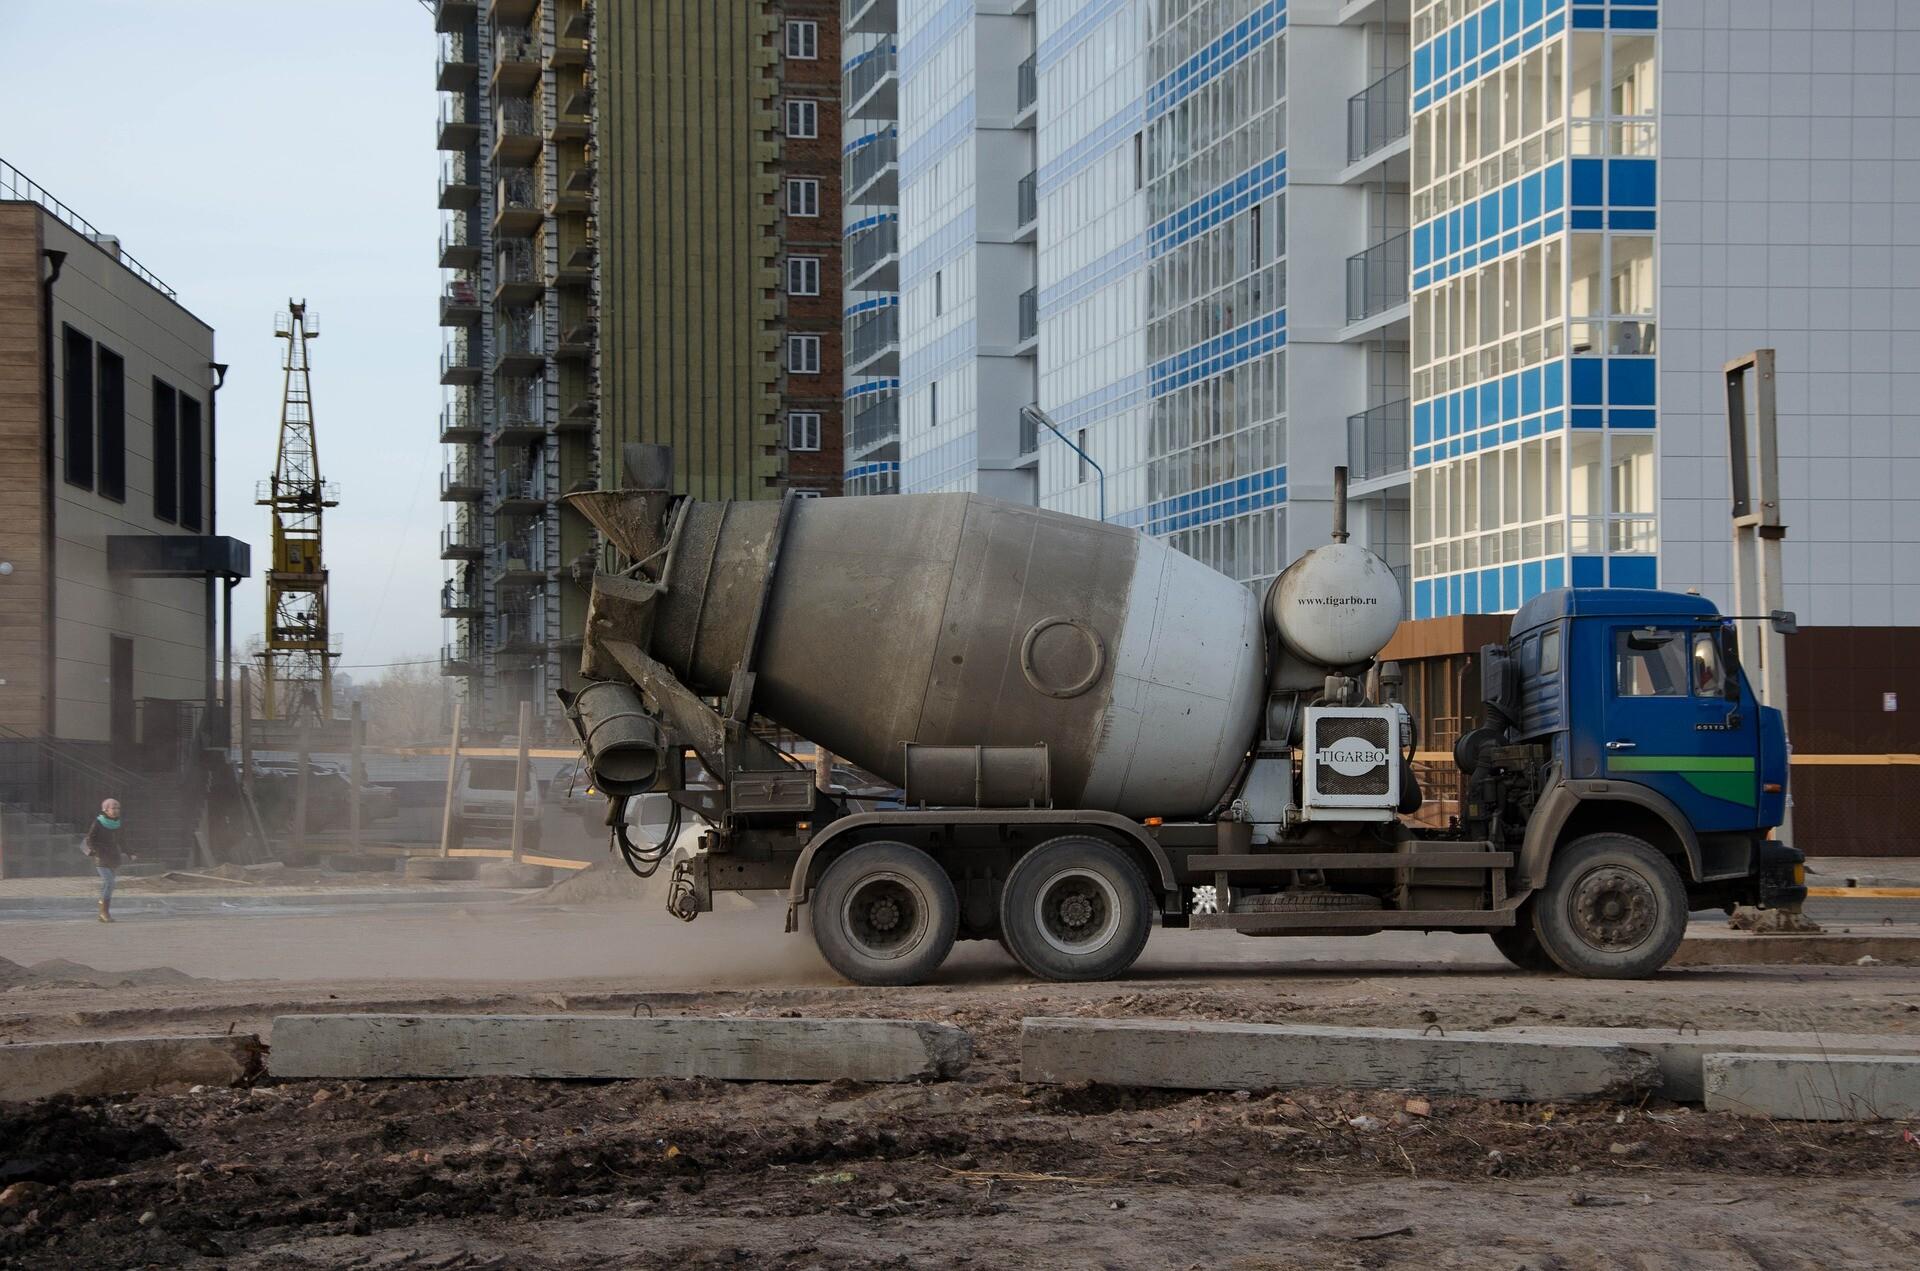 construccion-de-vivienda-INEGI-alt